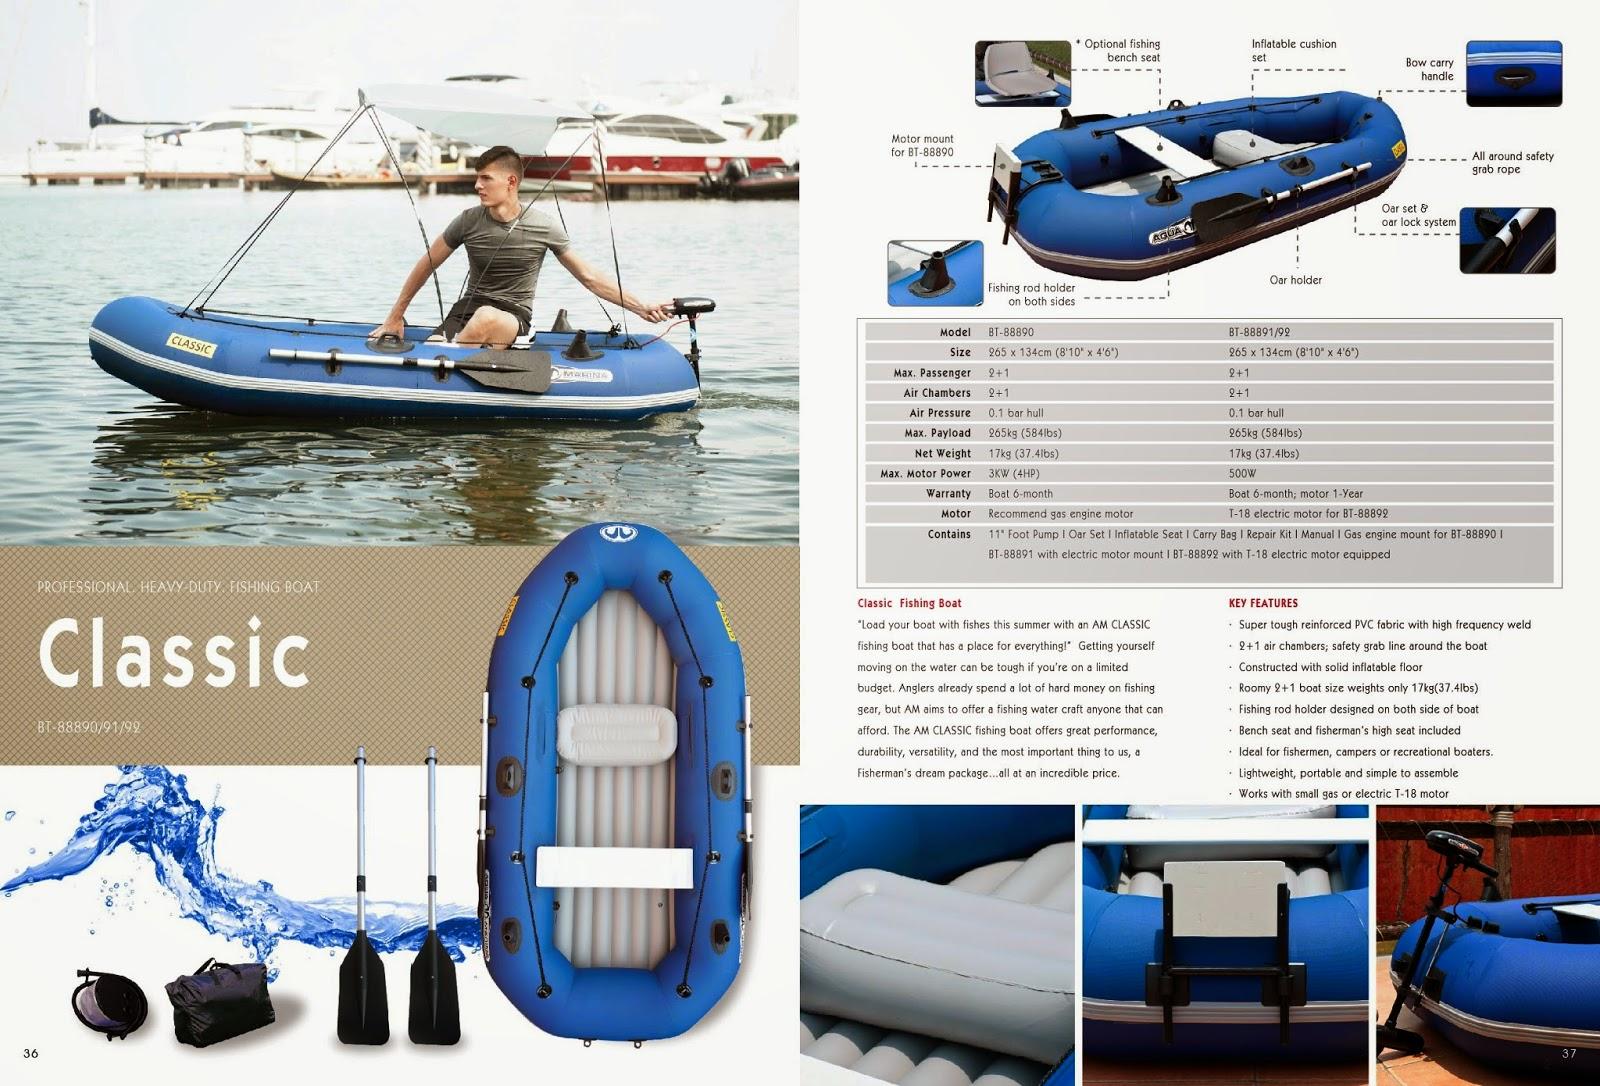 Inflatable-Boats, Inflatable-Raft, Inflatable-Kayak